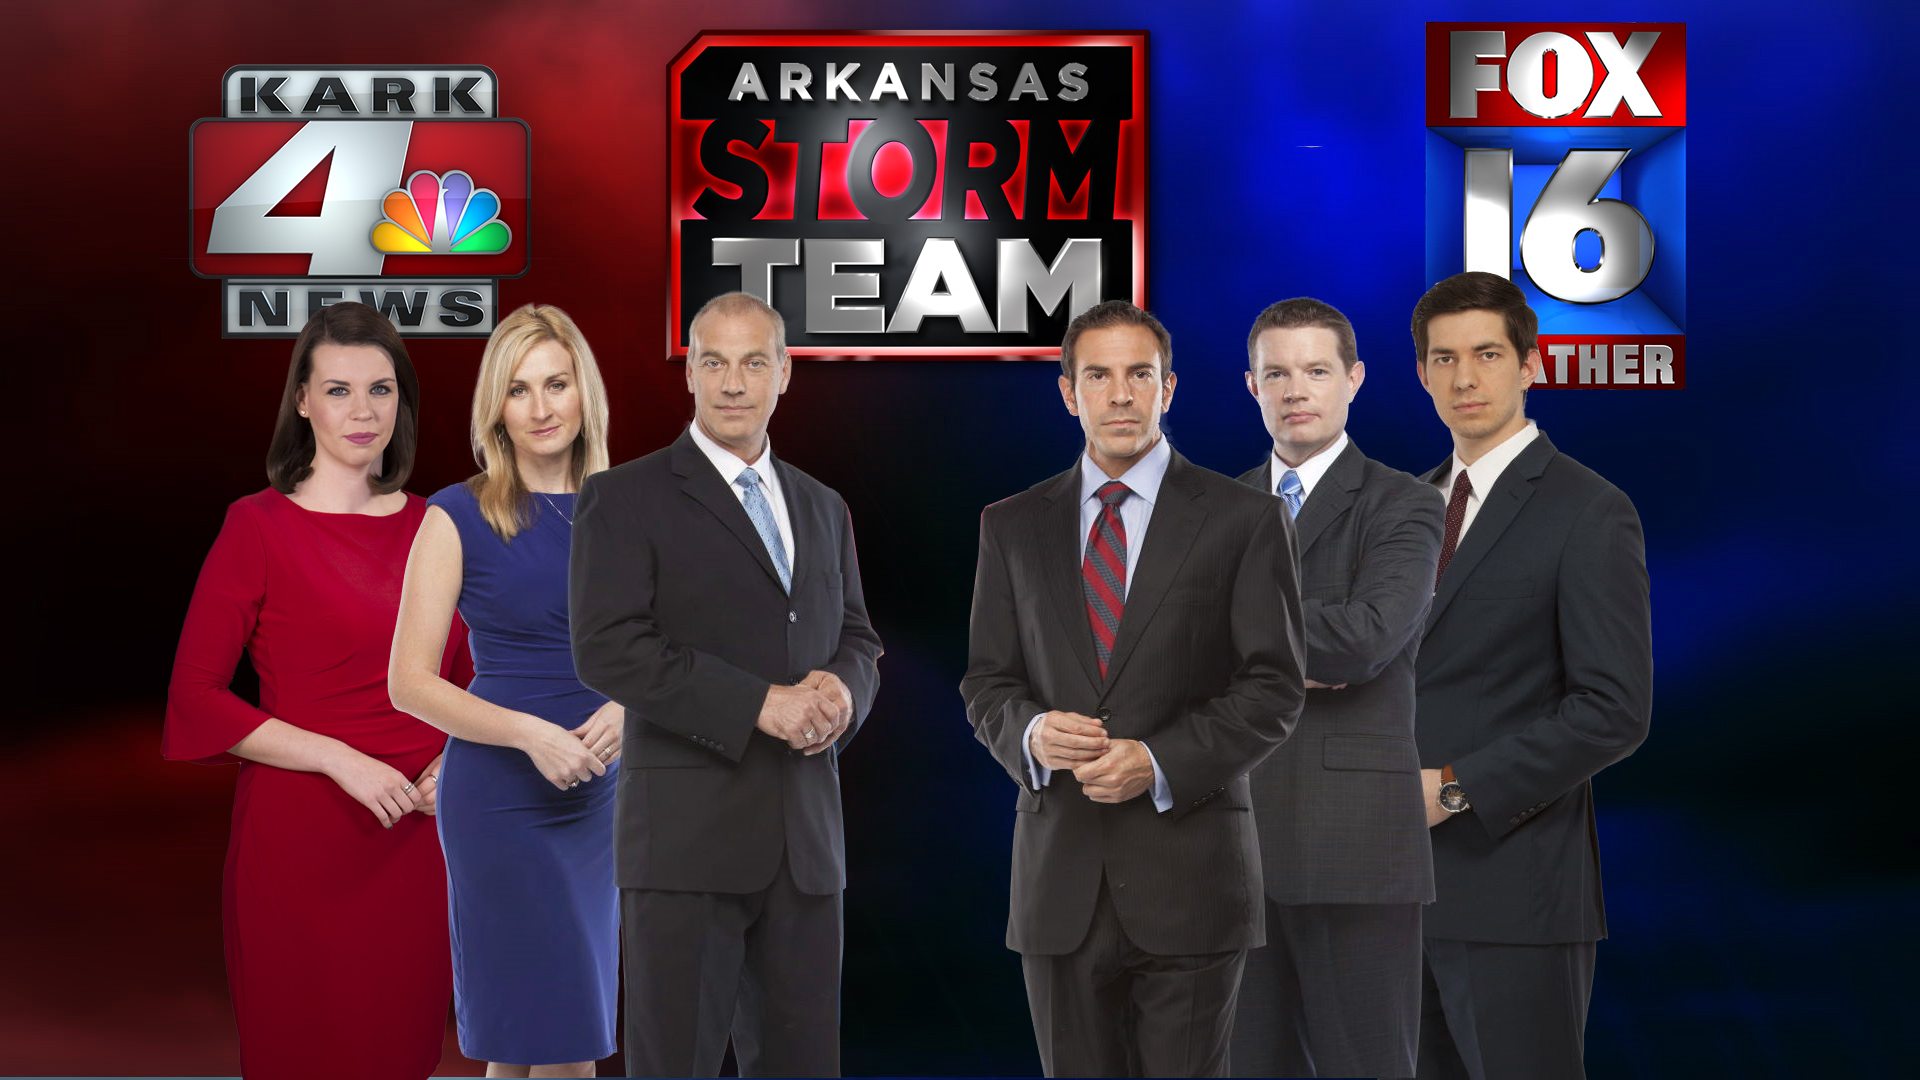 Arkansas Storm Team April 2019__NEW NEW 1554916606013.jpg-118809318.jpg